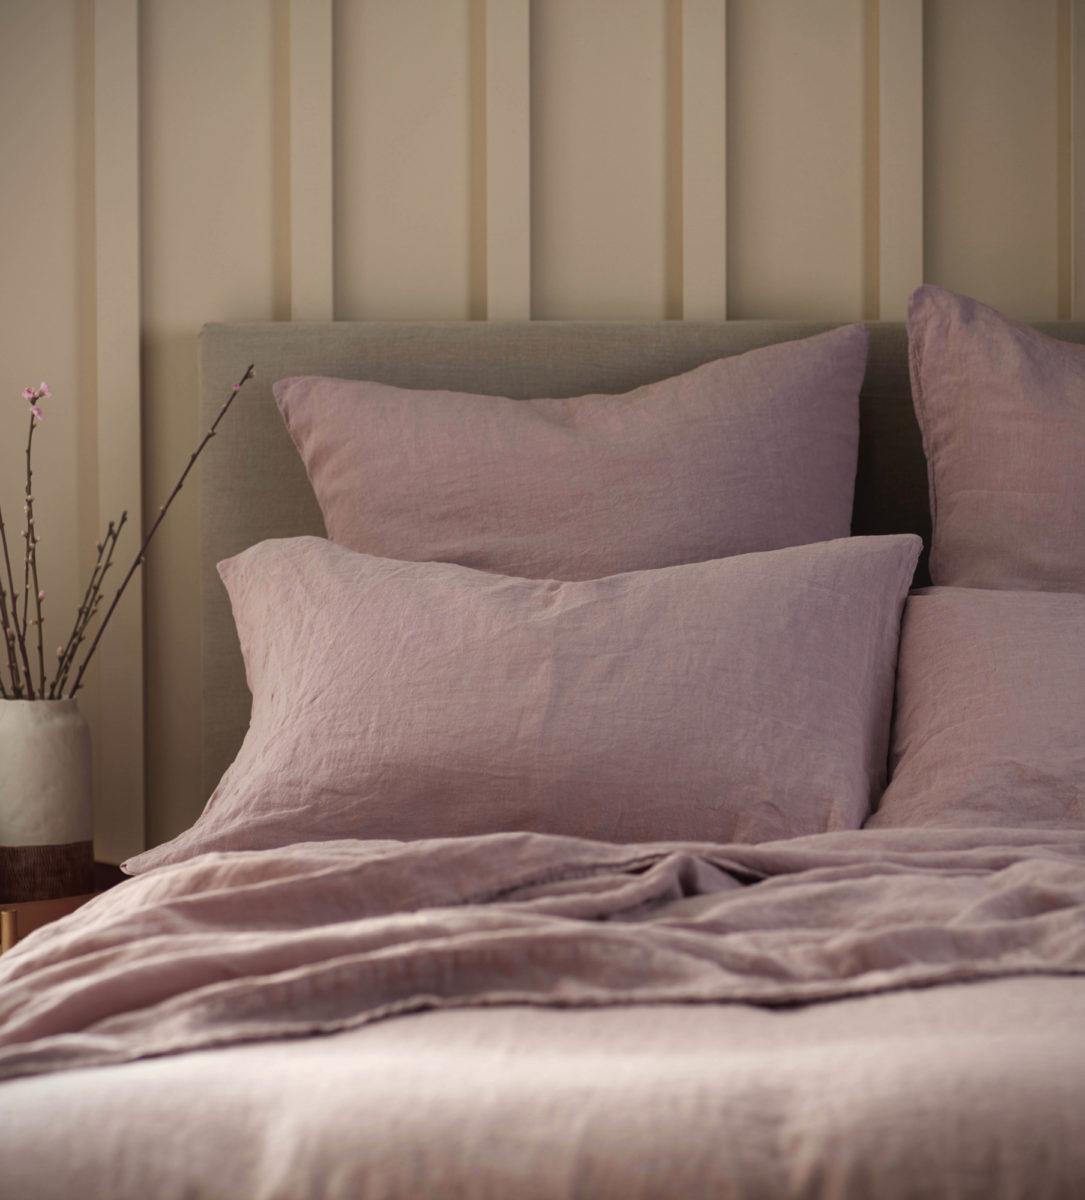 Vintage Rose Pink 100% Linen Pillowcase | Secret Linen Store